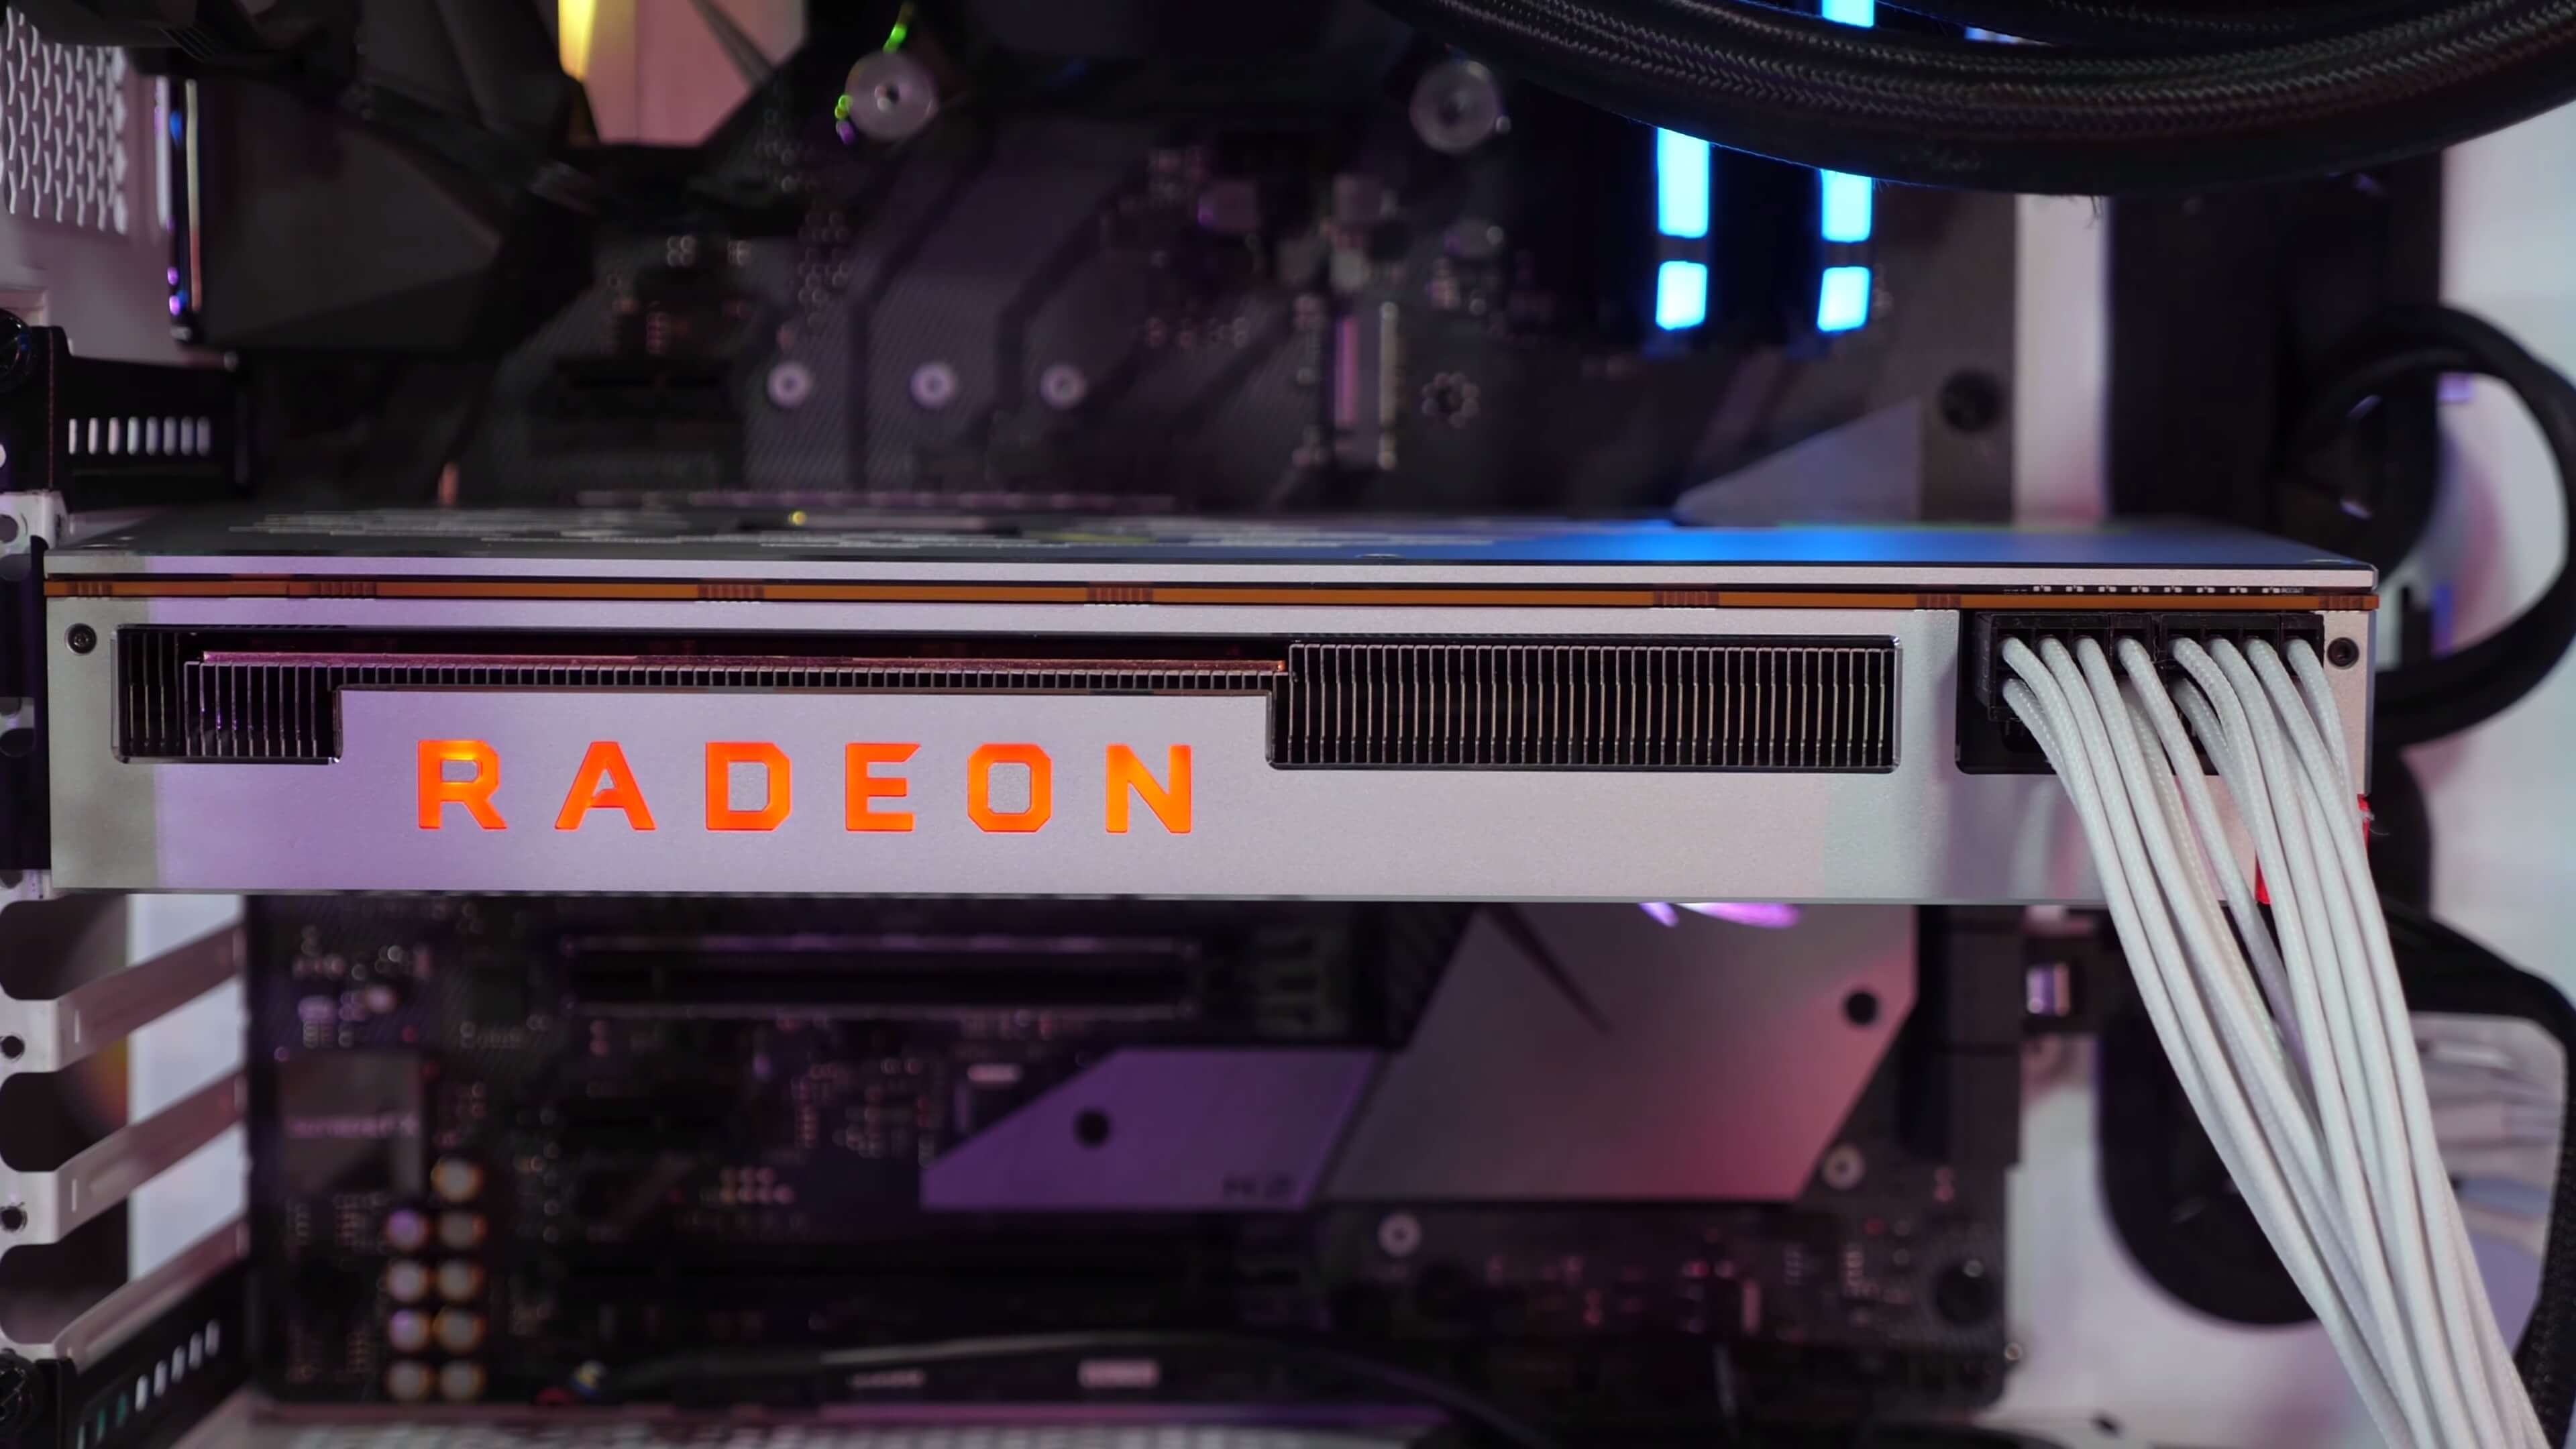 Radeon Vii Vs Geforce Rtx 2080